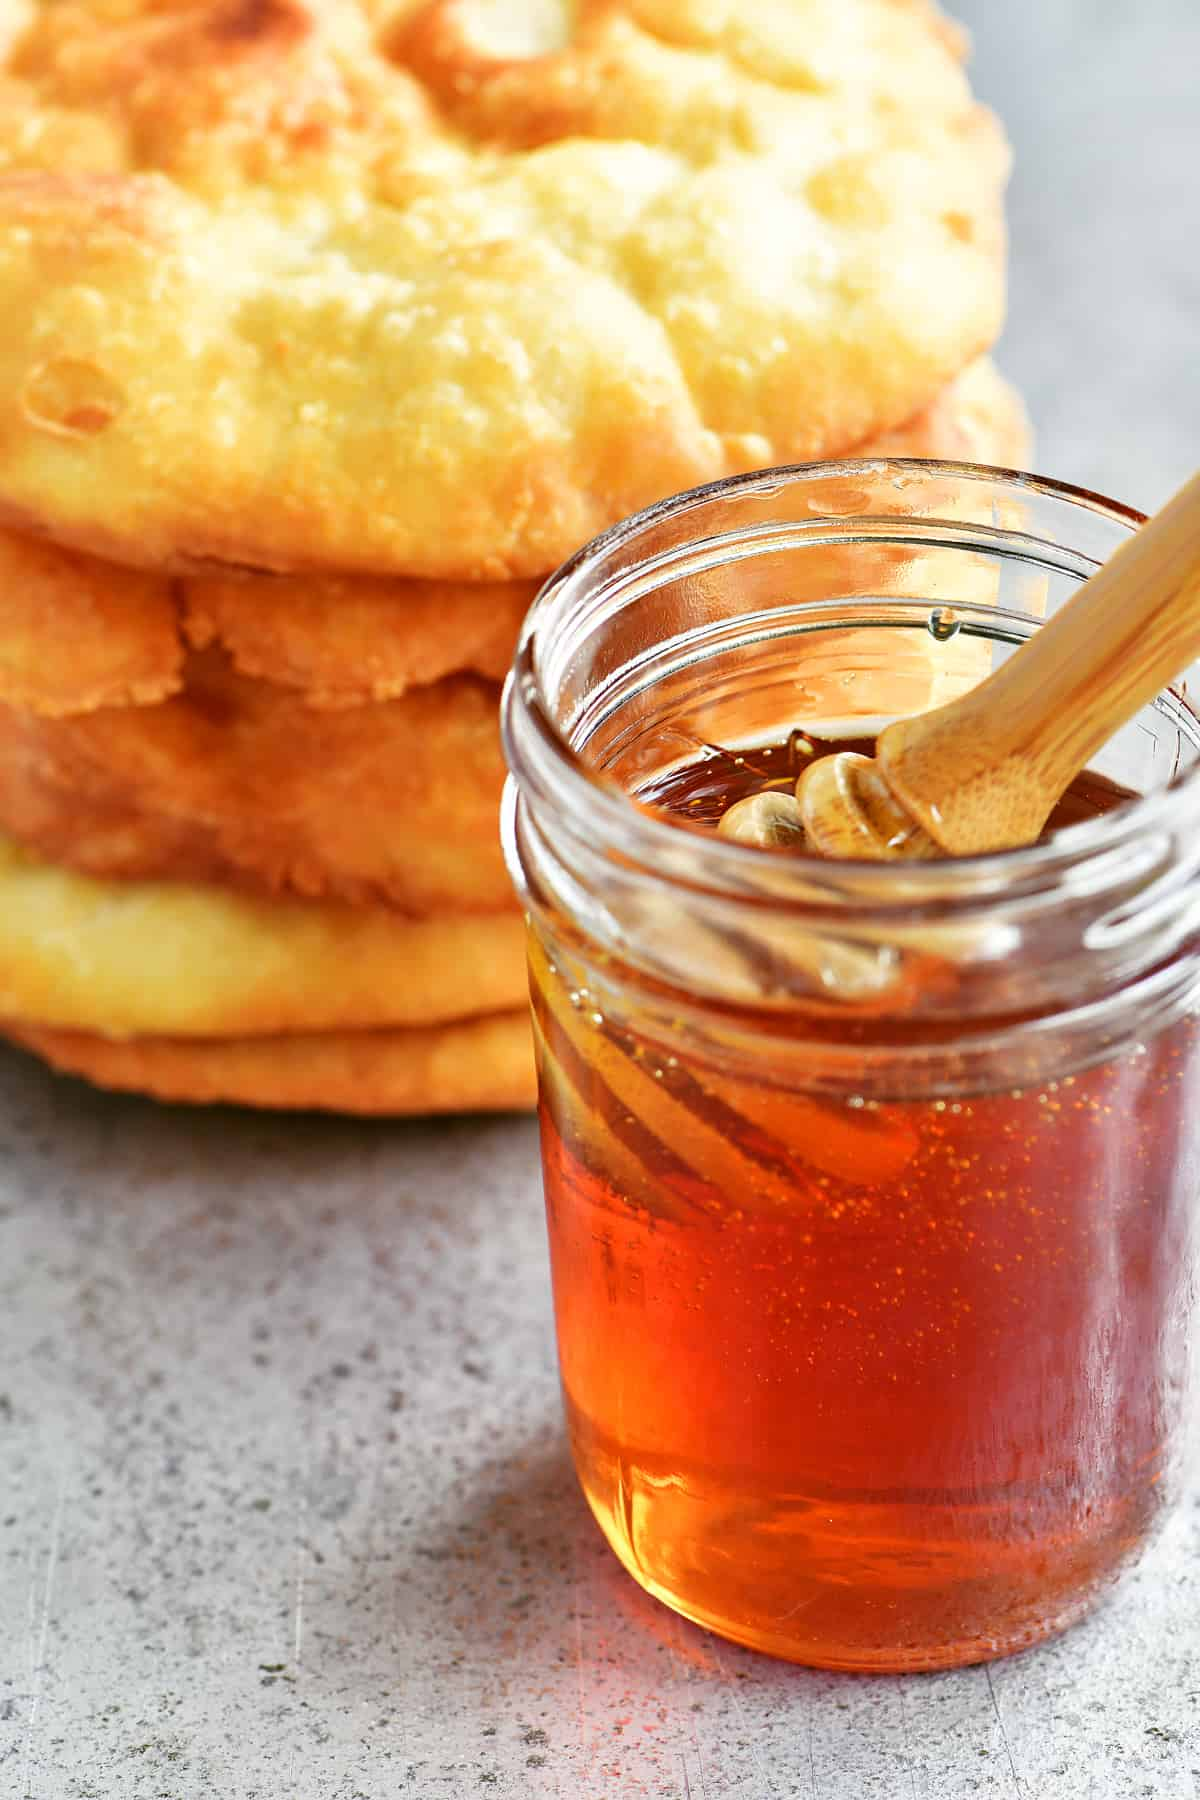 honey dipper in a jar of honey